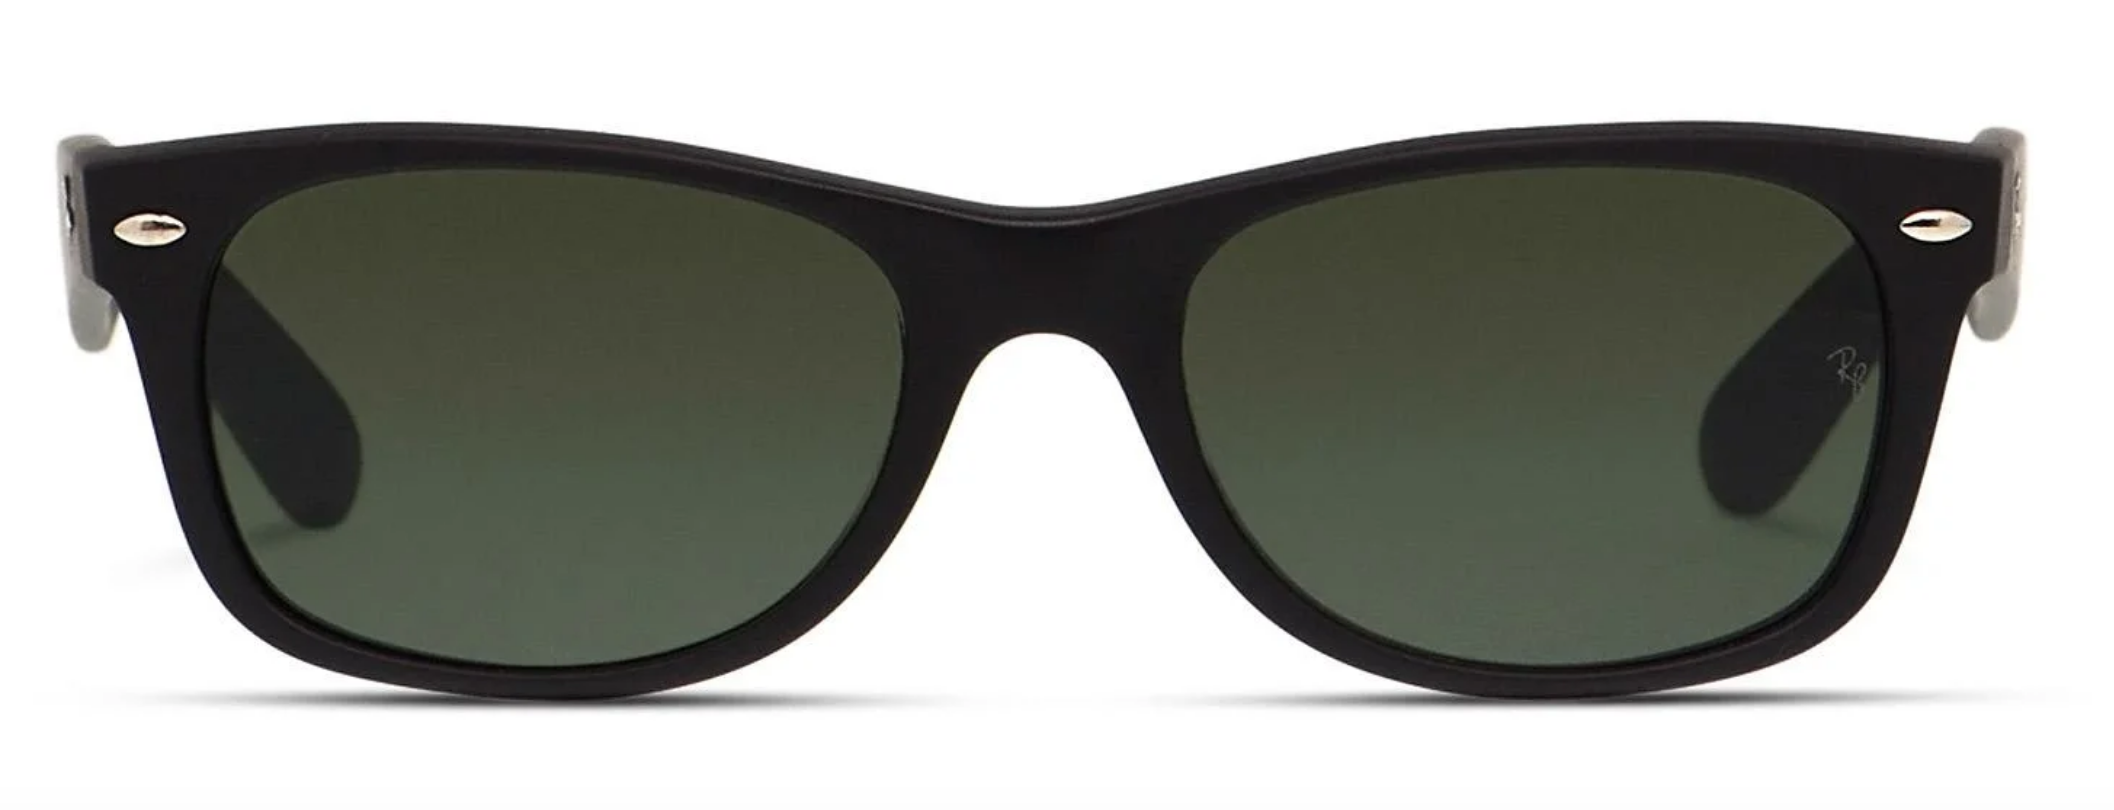 wayfarer sunglasses new Ray Bans